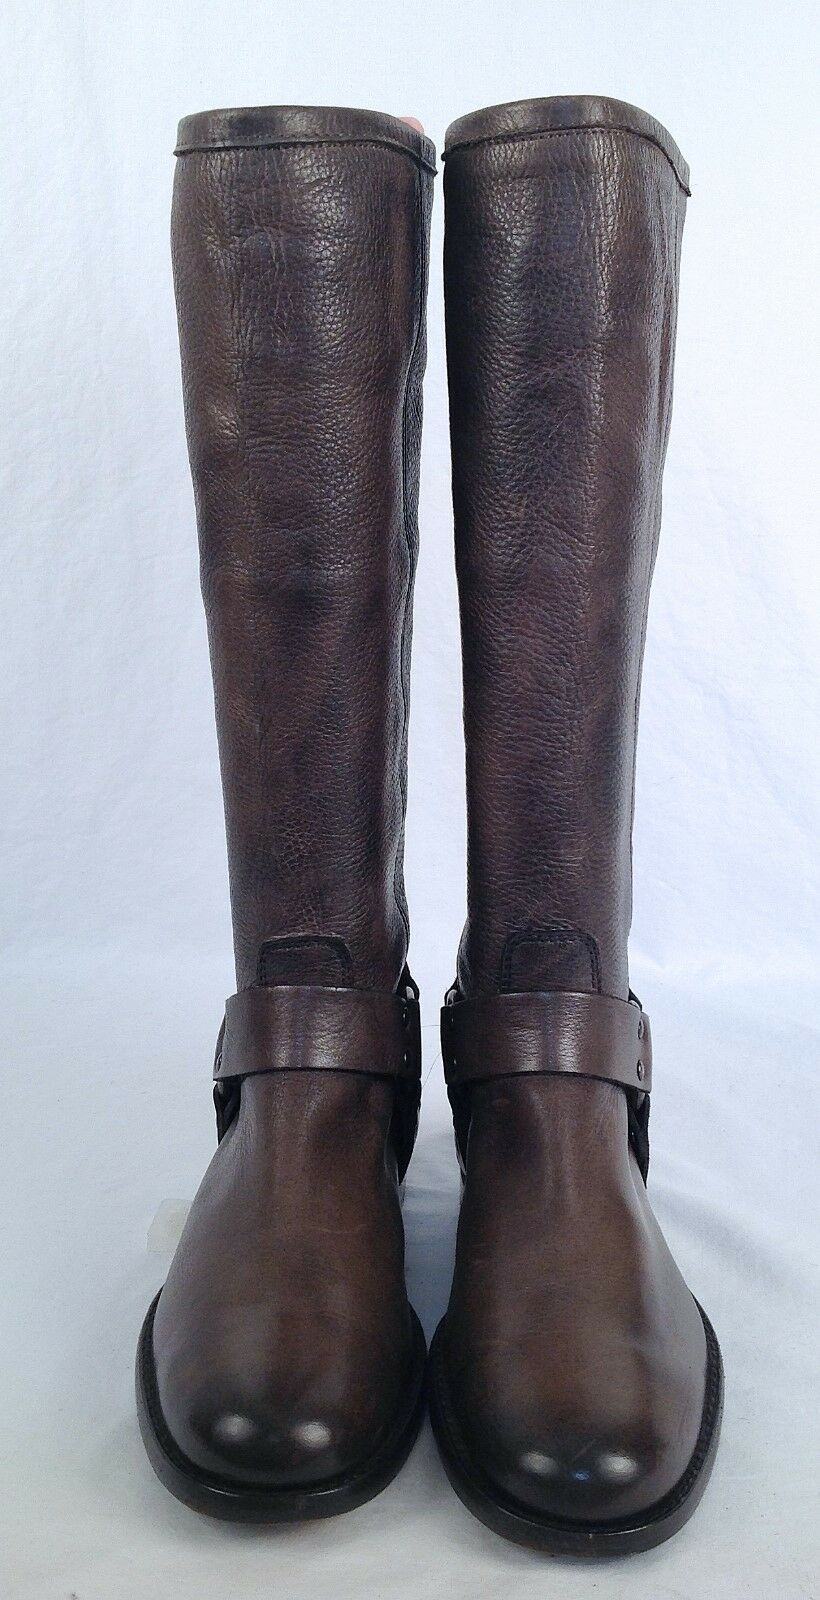 Frye Phillip Harness Boot- B Braun- Größe 5.5 B Boot-  (B70) 6351e2